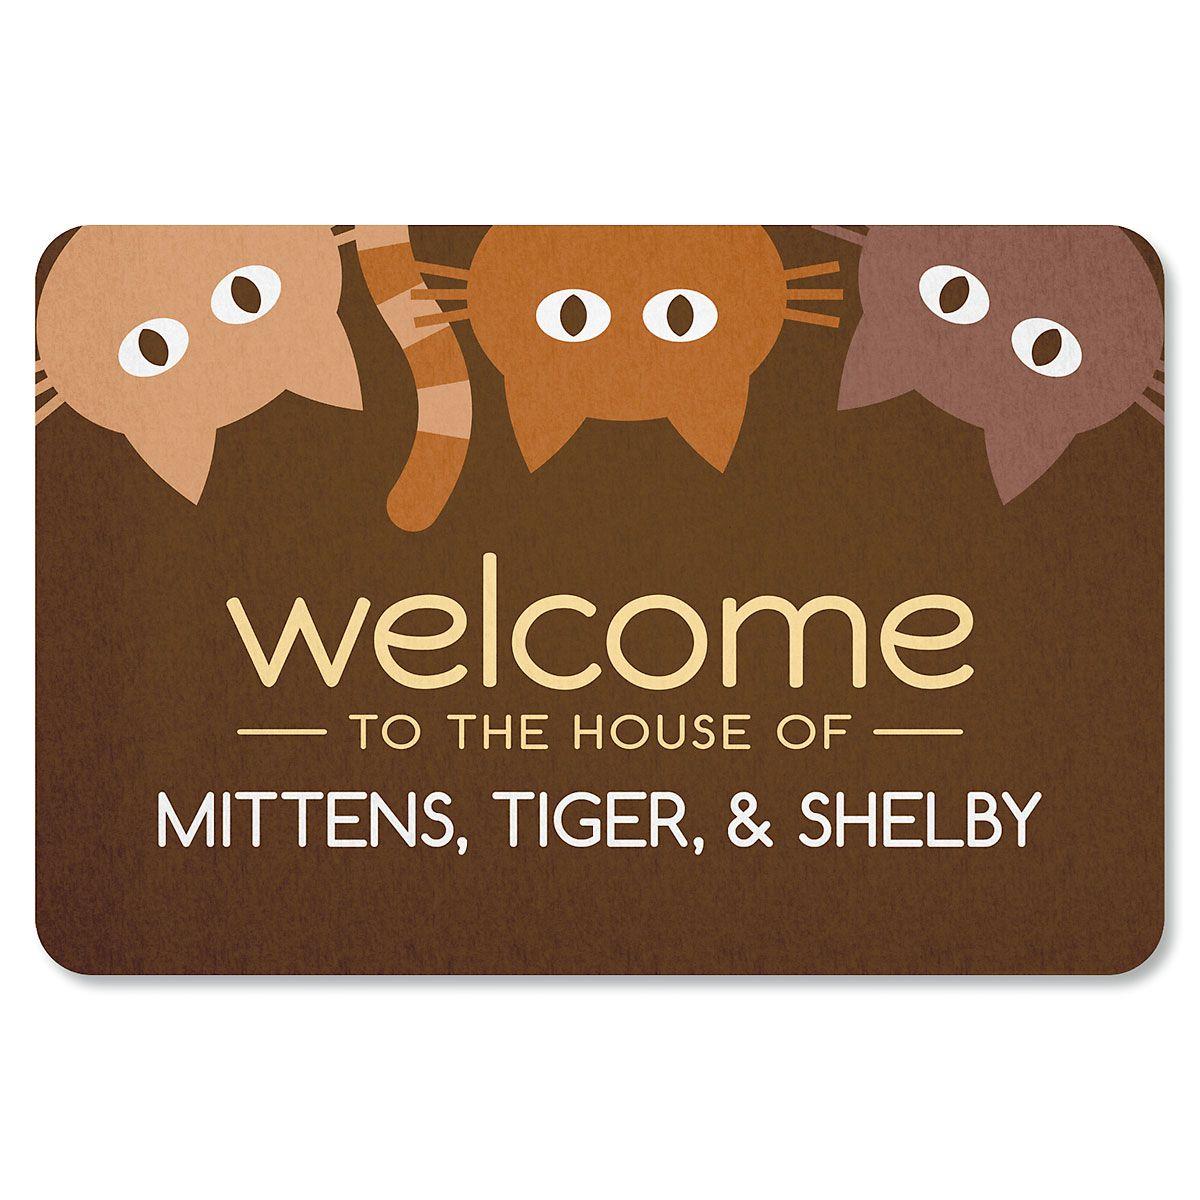 Personalized Cat Welcome Doormat-3 Cats-615568C